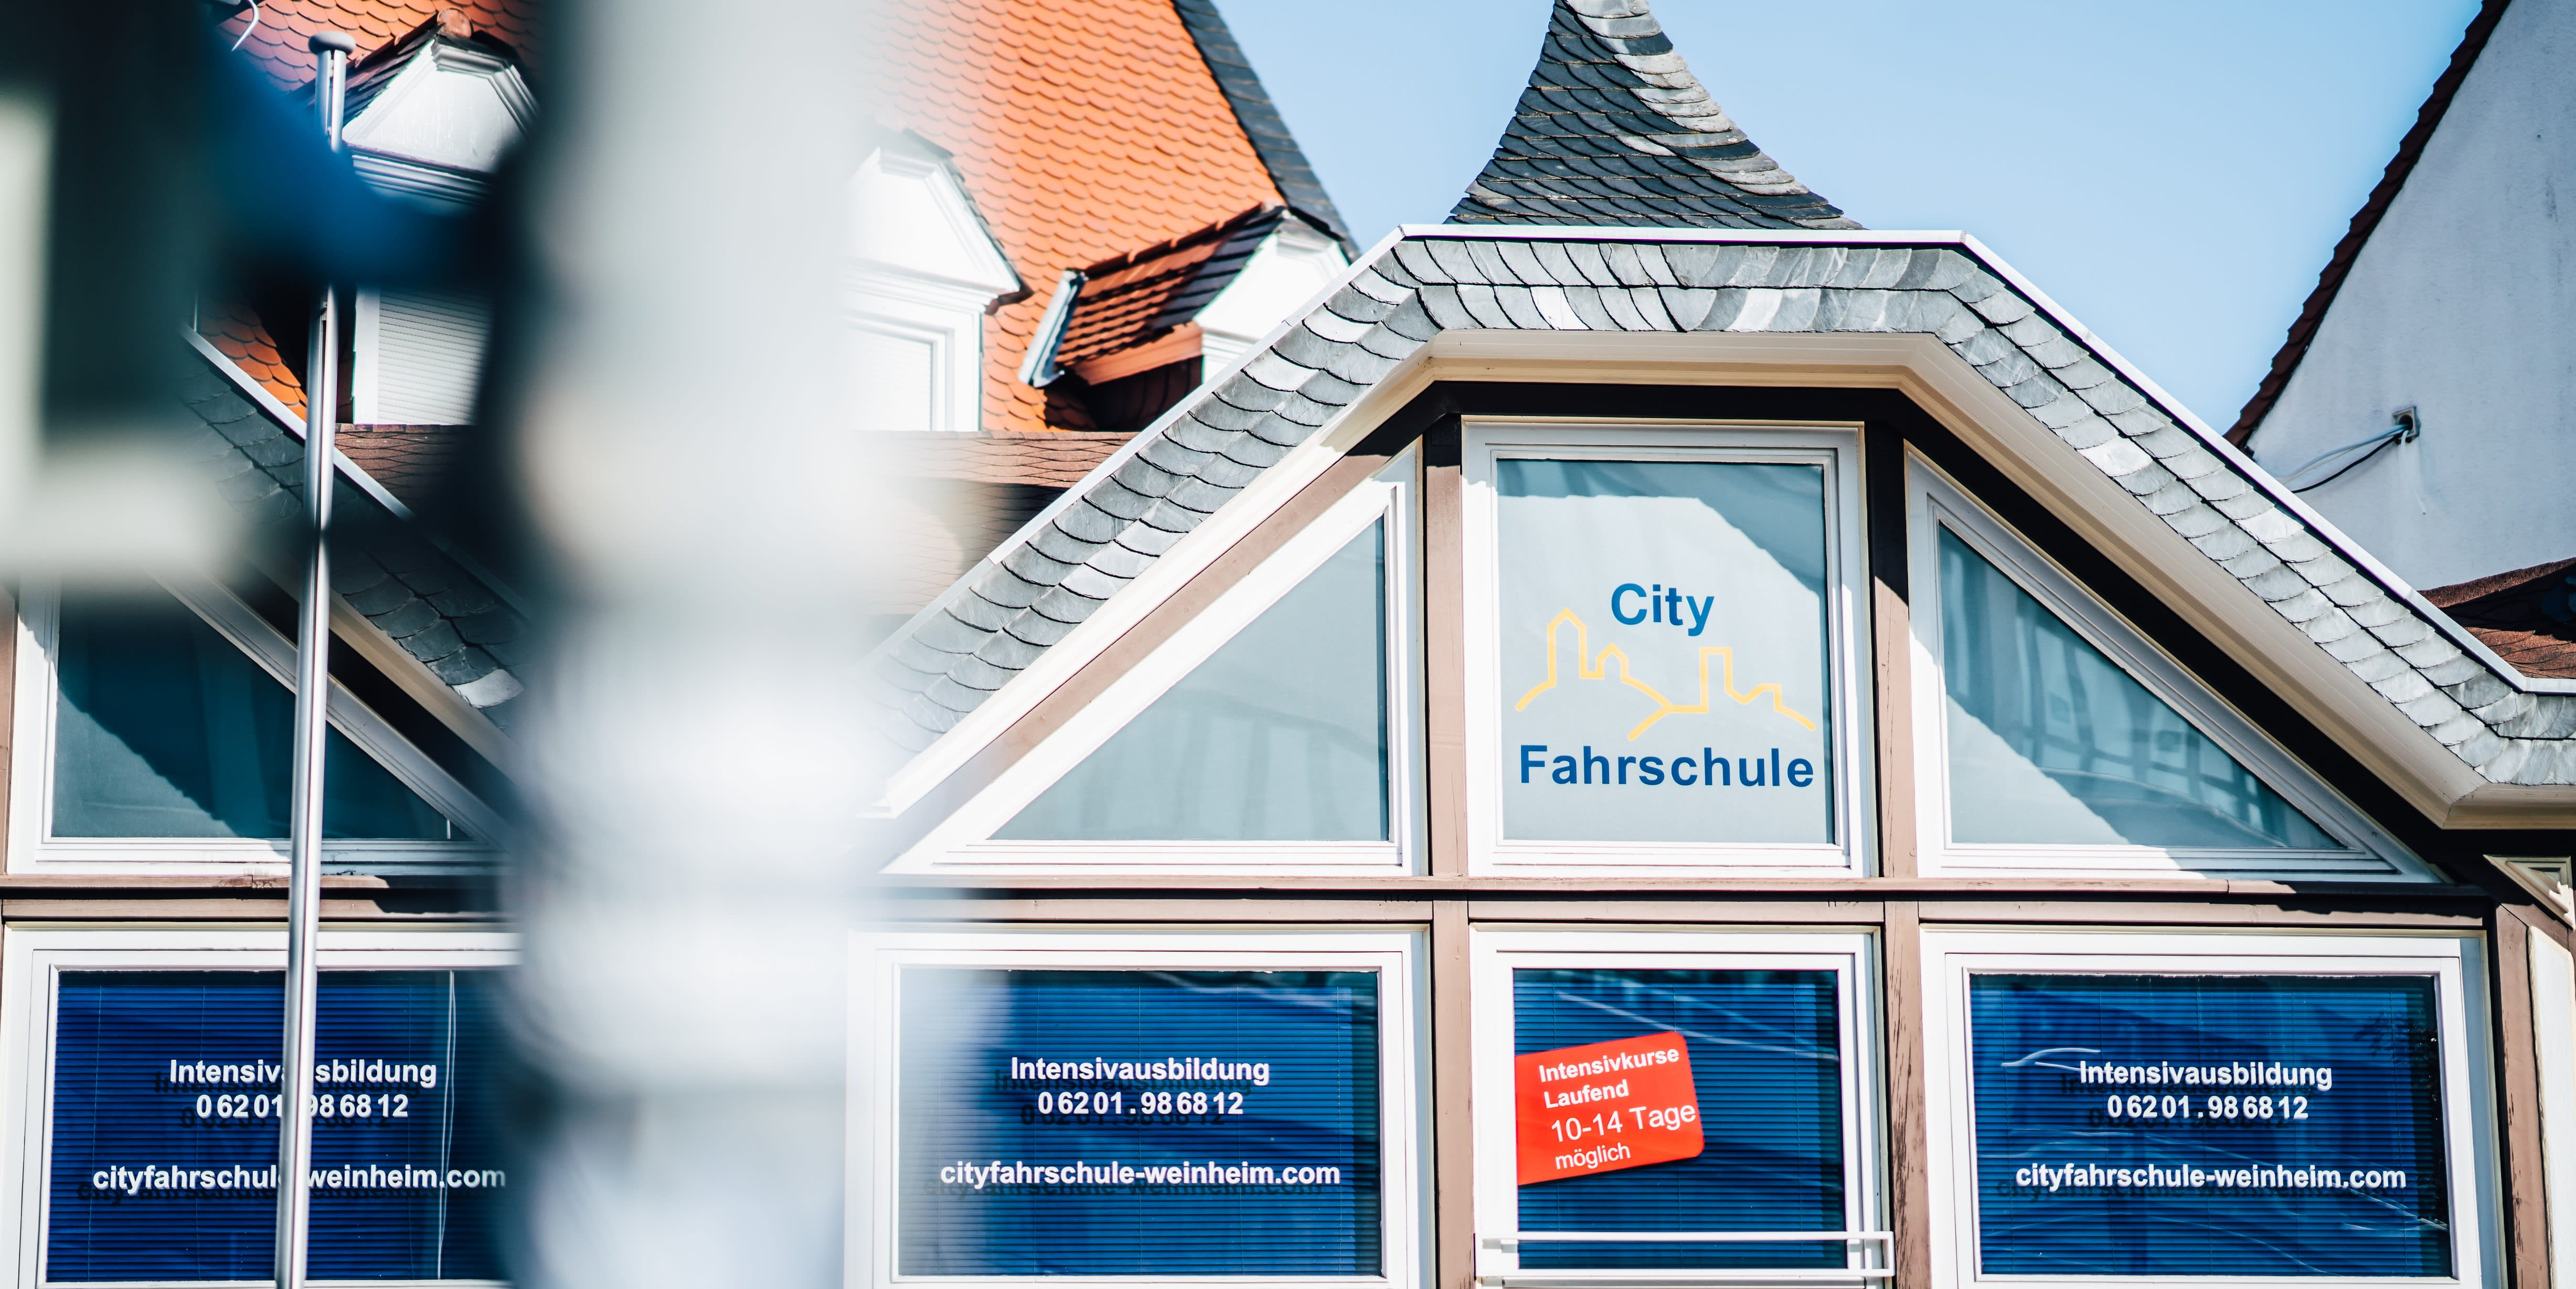 City Fahrschule Weinheim außen